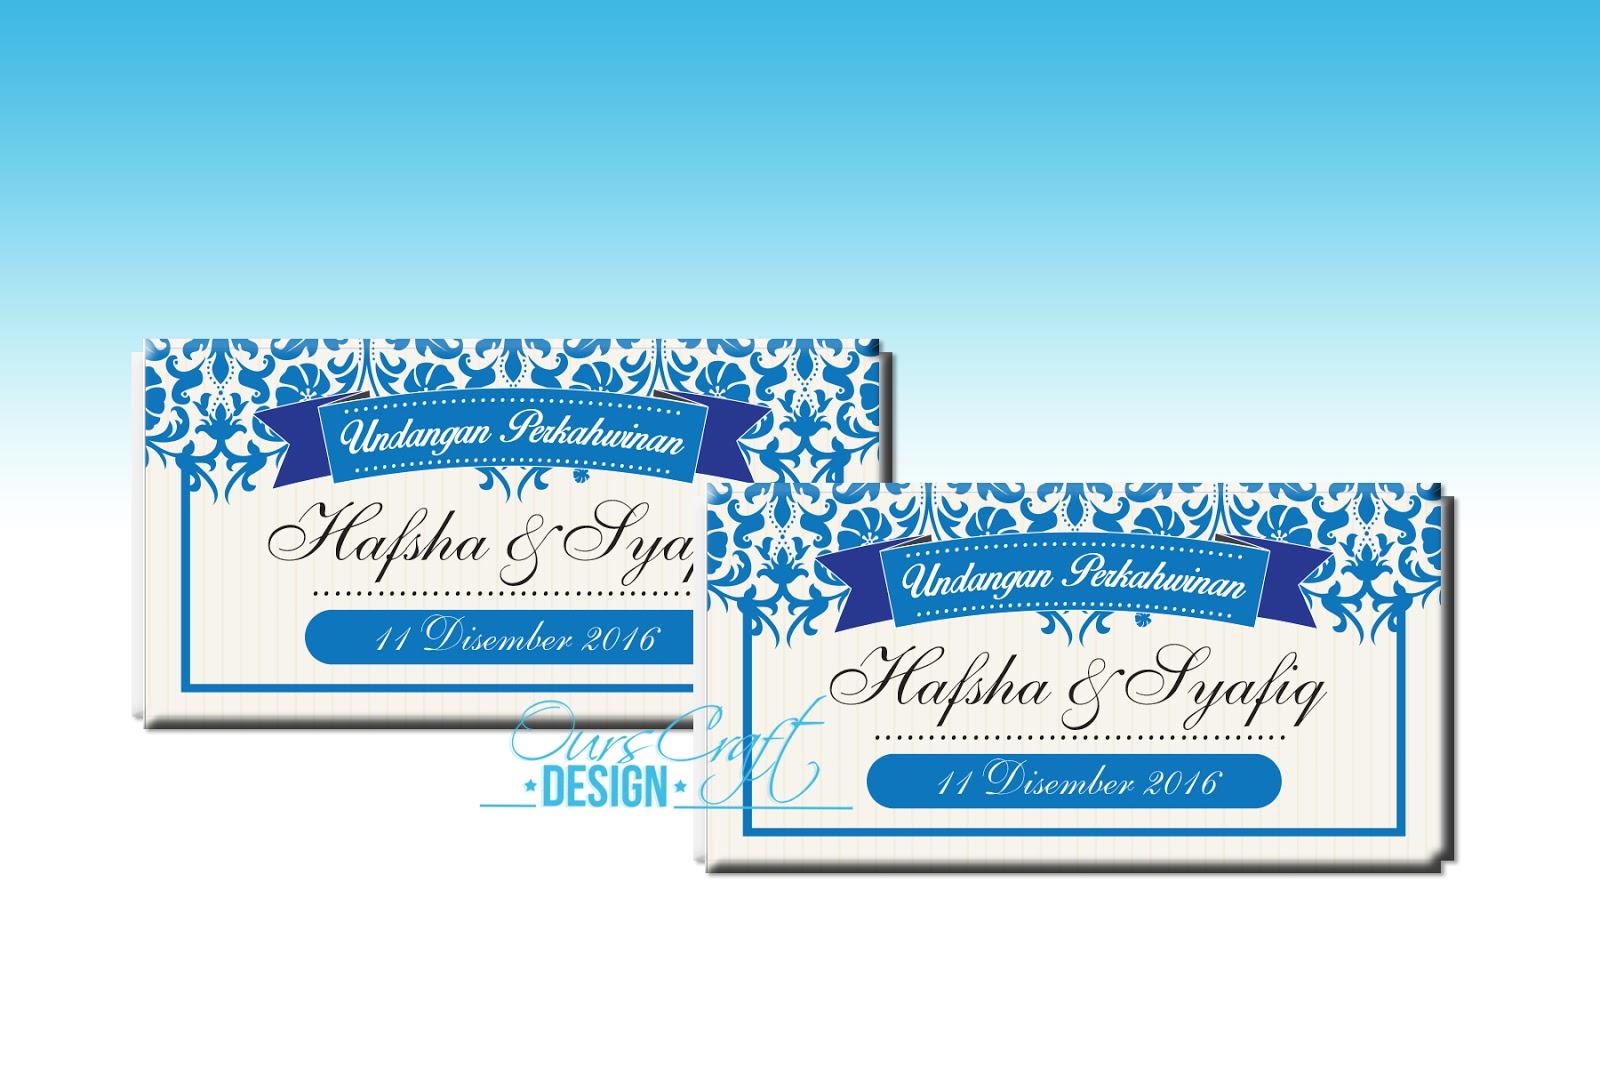 Penyatuan 2 Hati - Hafsha & Syafiq (design 2)